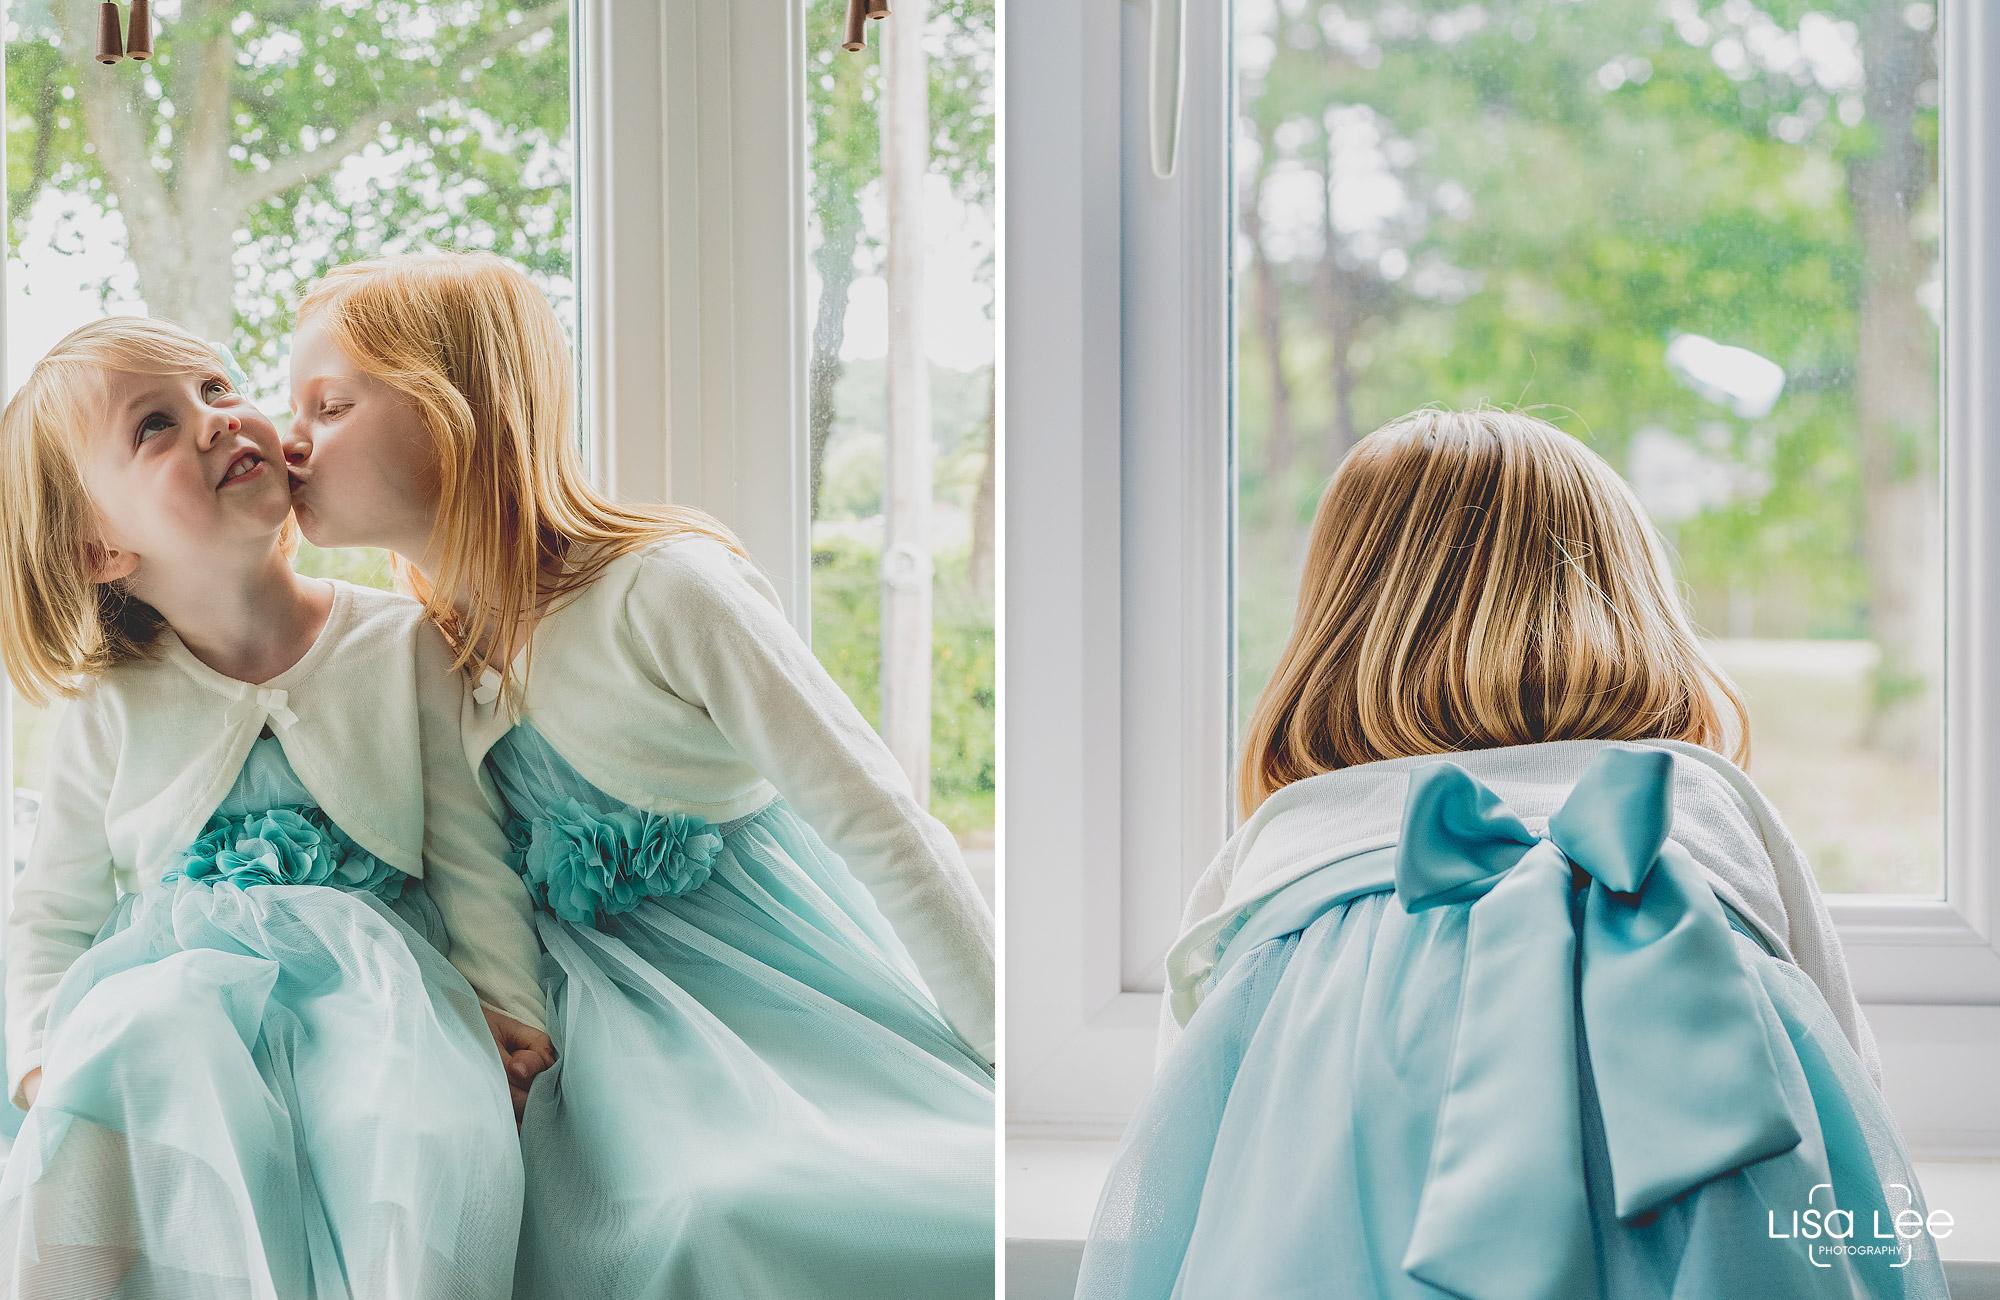 lisa-lee-wedding-photography-bridesmaids.jpg